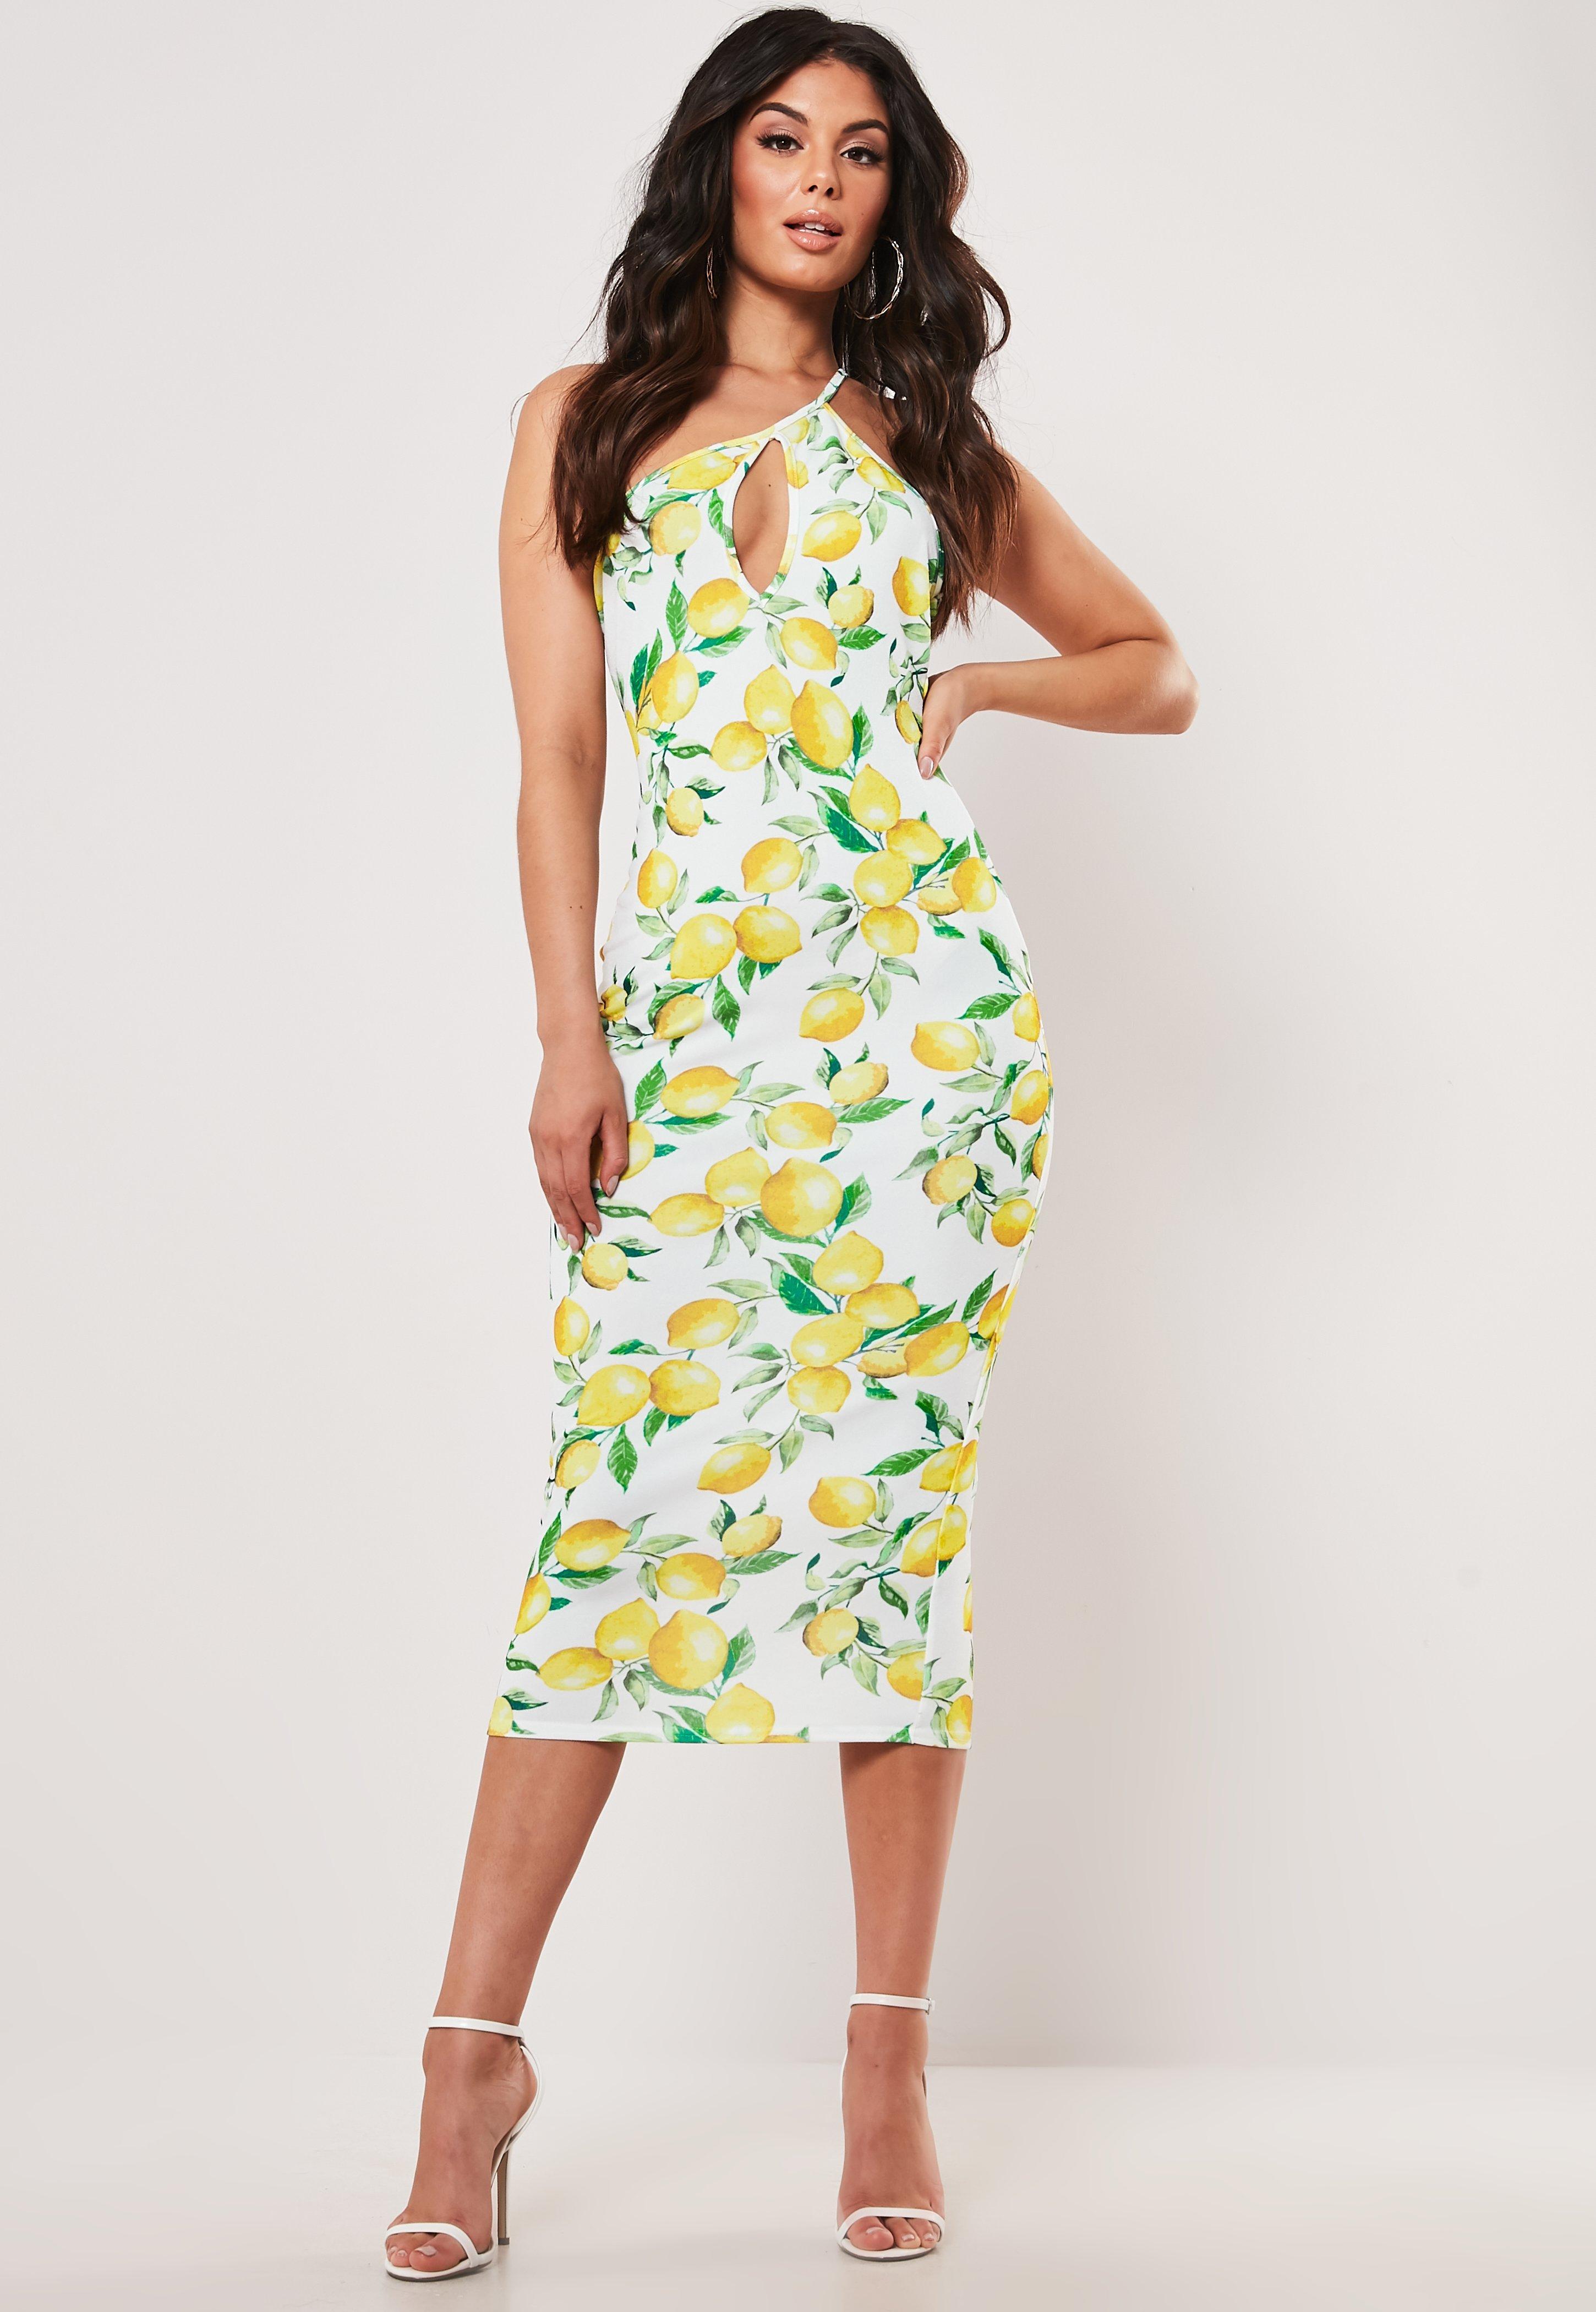 1326b29f892 One Shoulder Dresses- Shop One Sleeve Dresses | Missguided